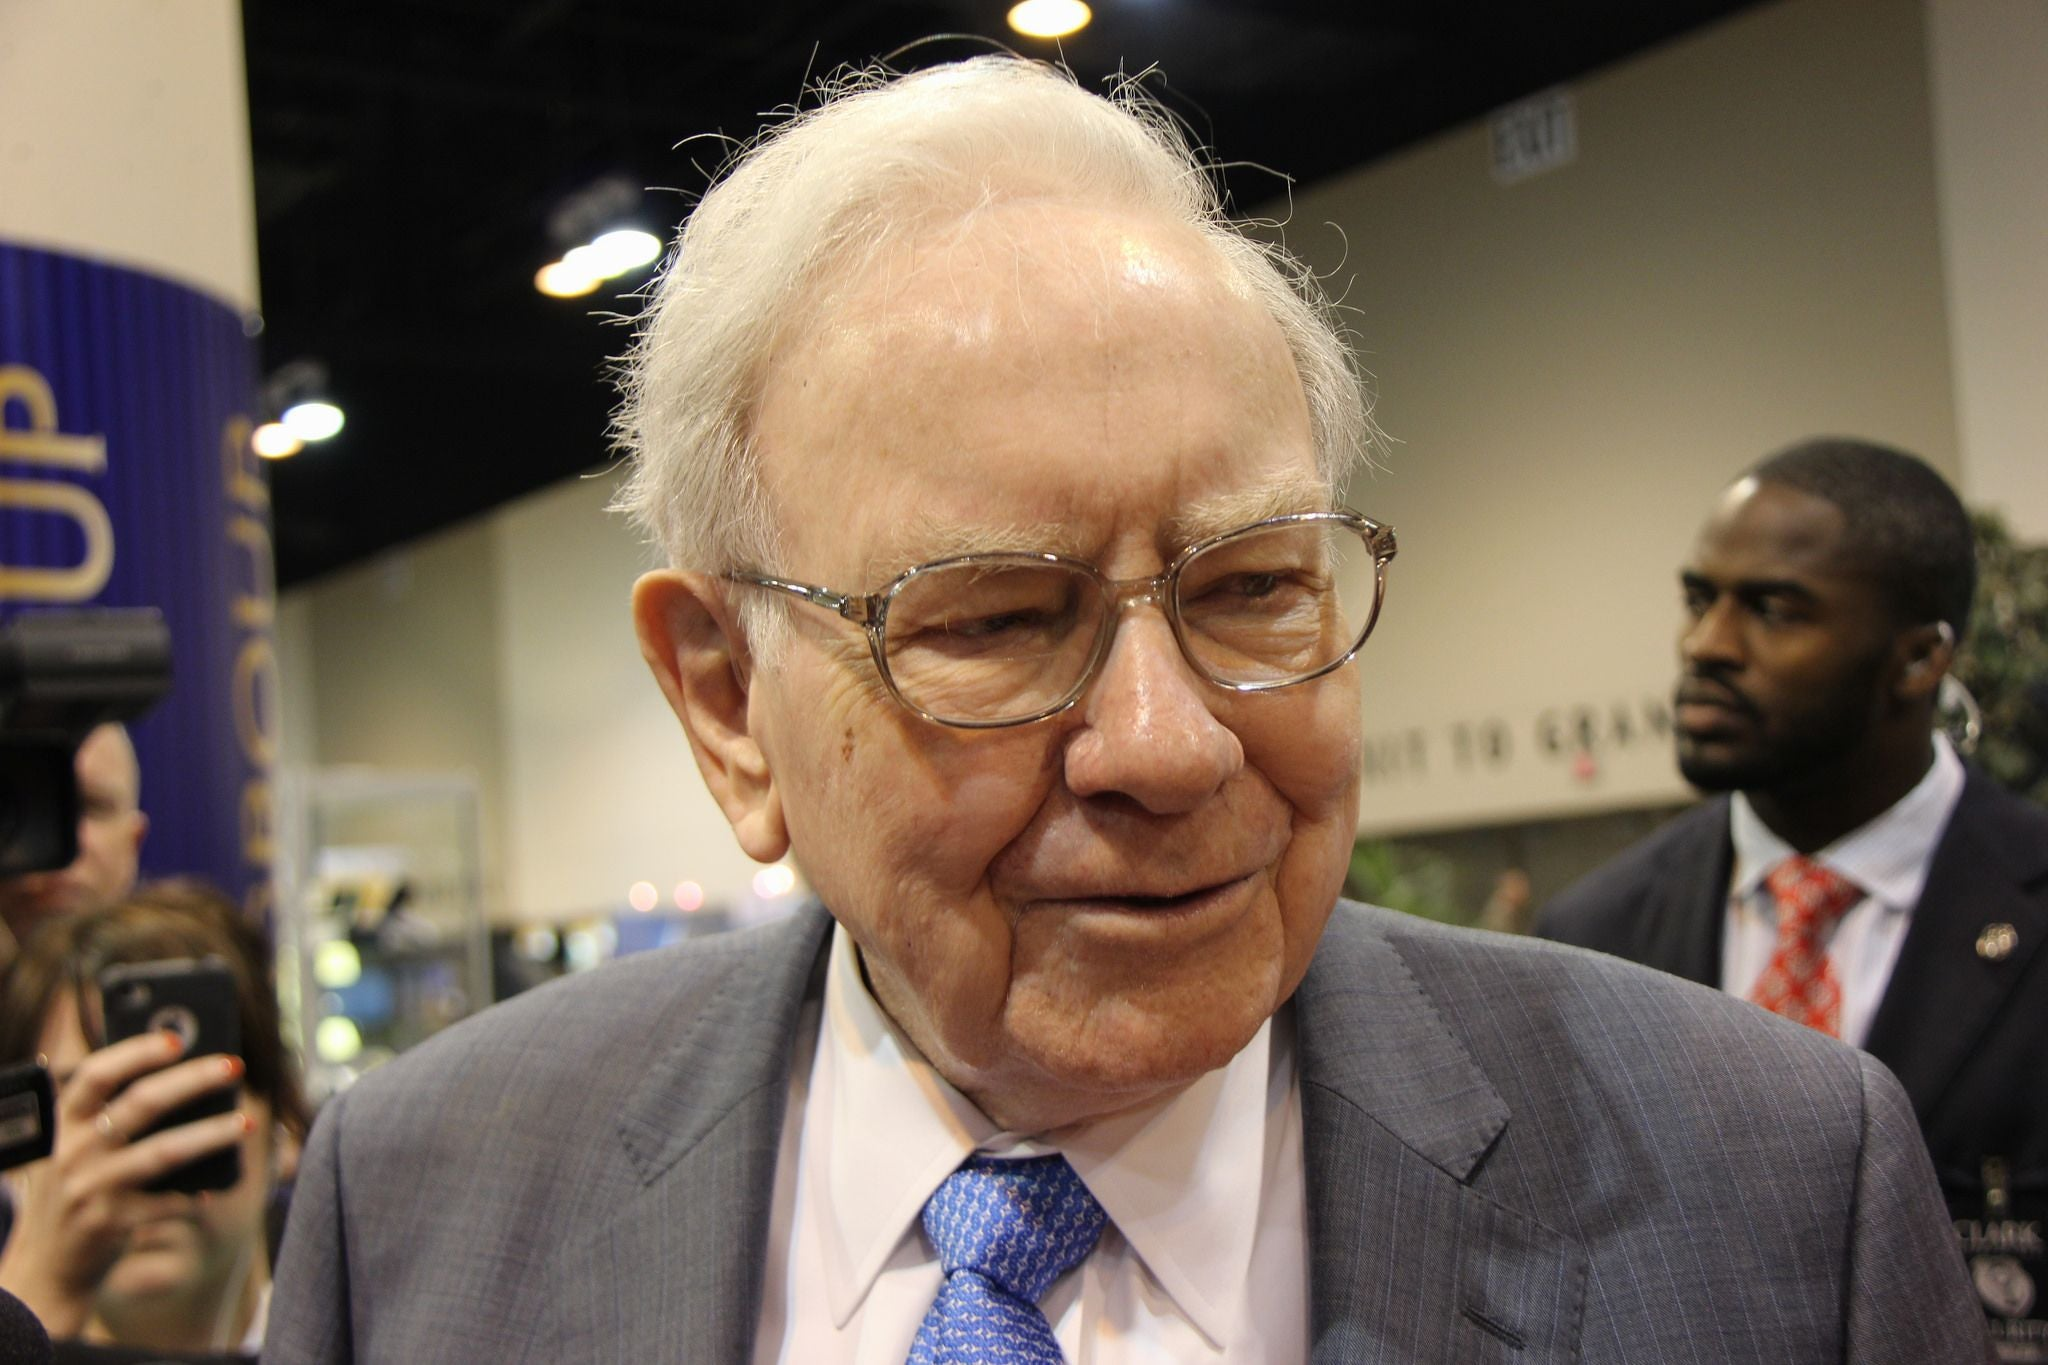 4 Warren Buffett Principles for Investing in the Coronavirus Crash | The Motley Fool